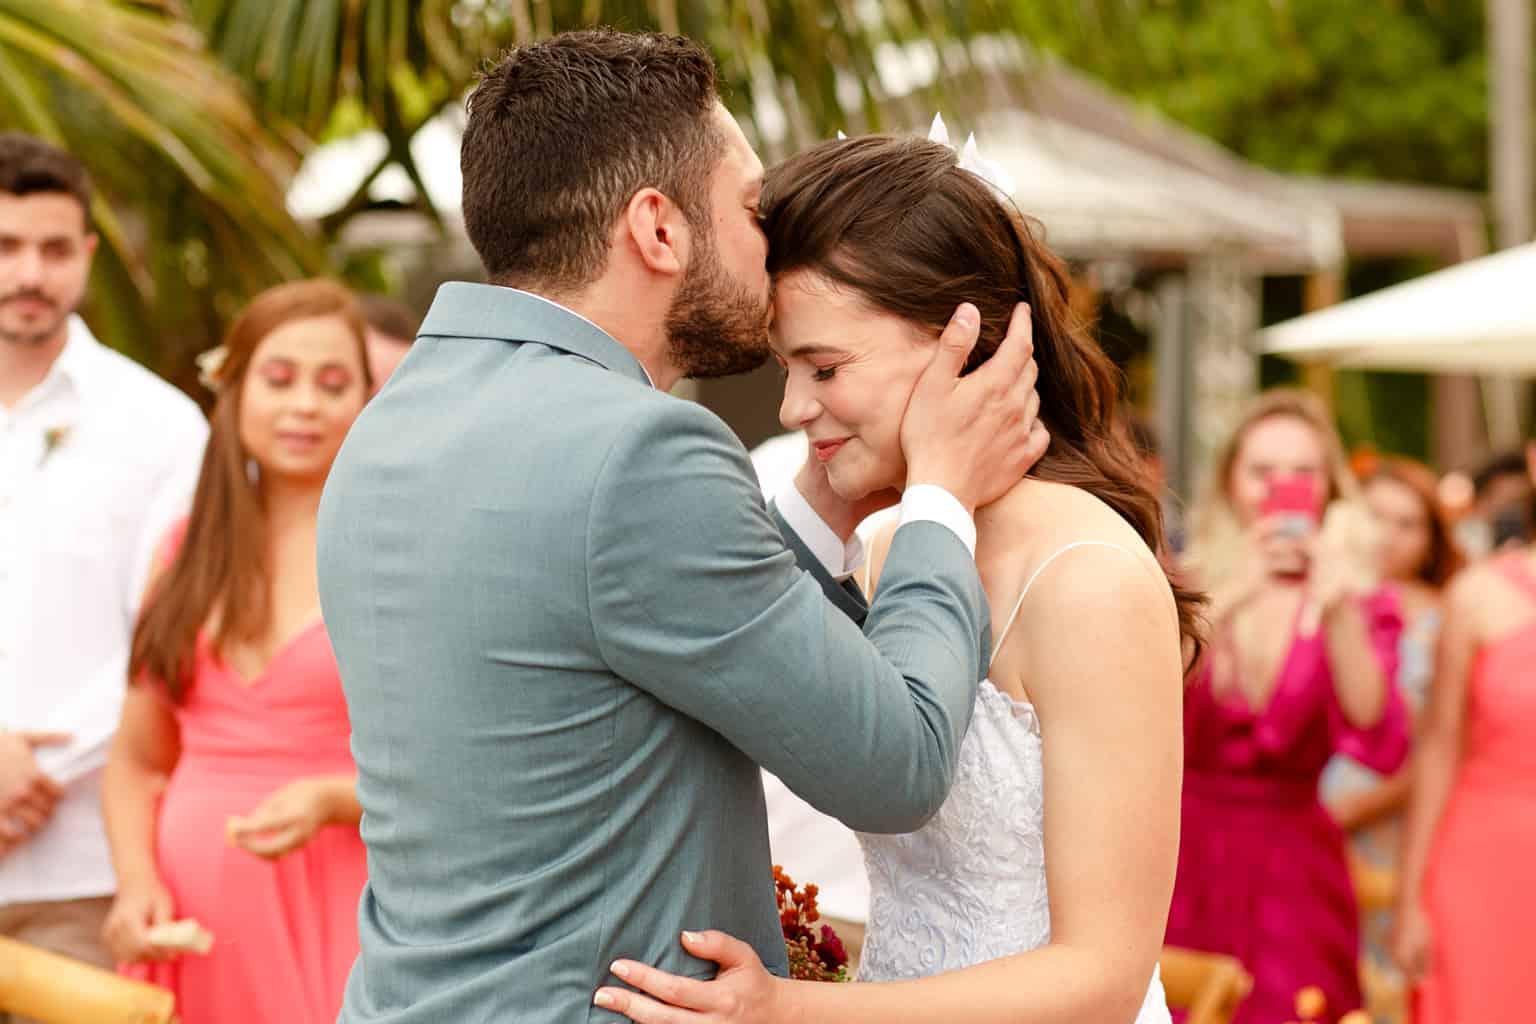 Casamento-Emanuelle-e-Alysson-Fotografia-Tadeu-Nanó-e-Luca-Antunes79-1